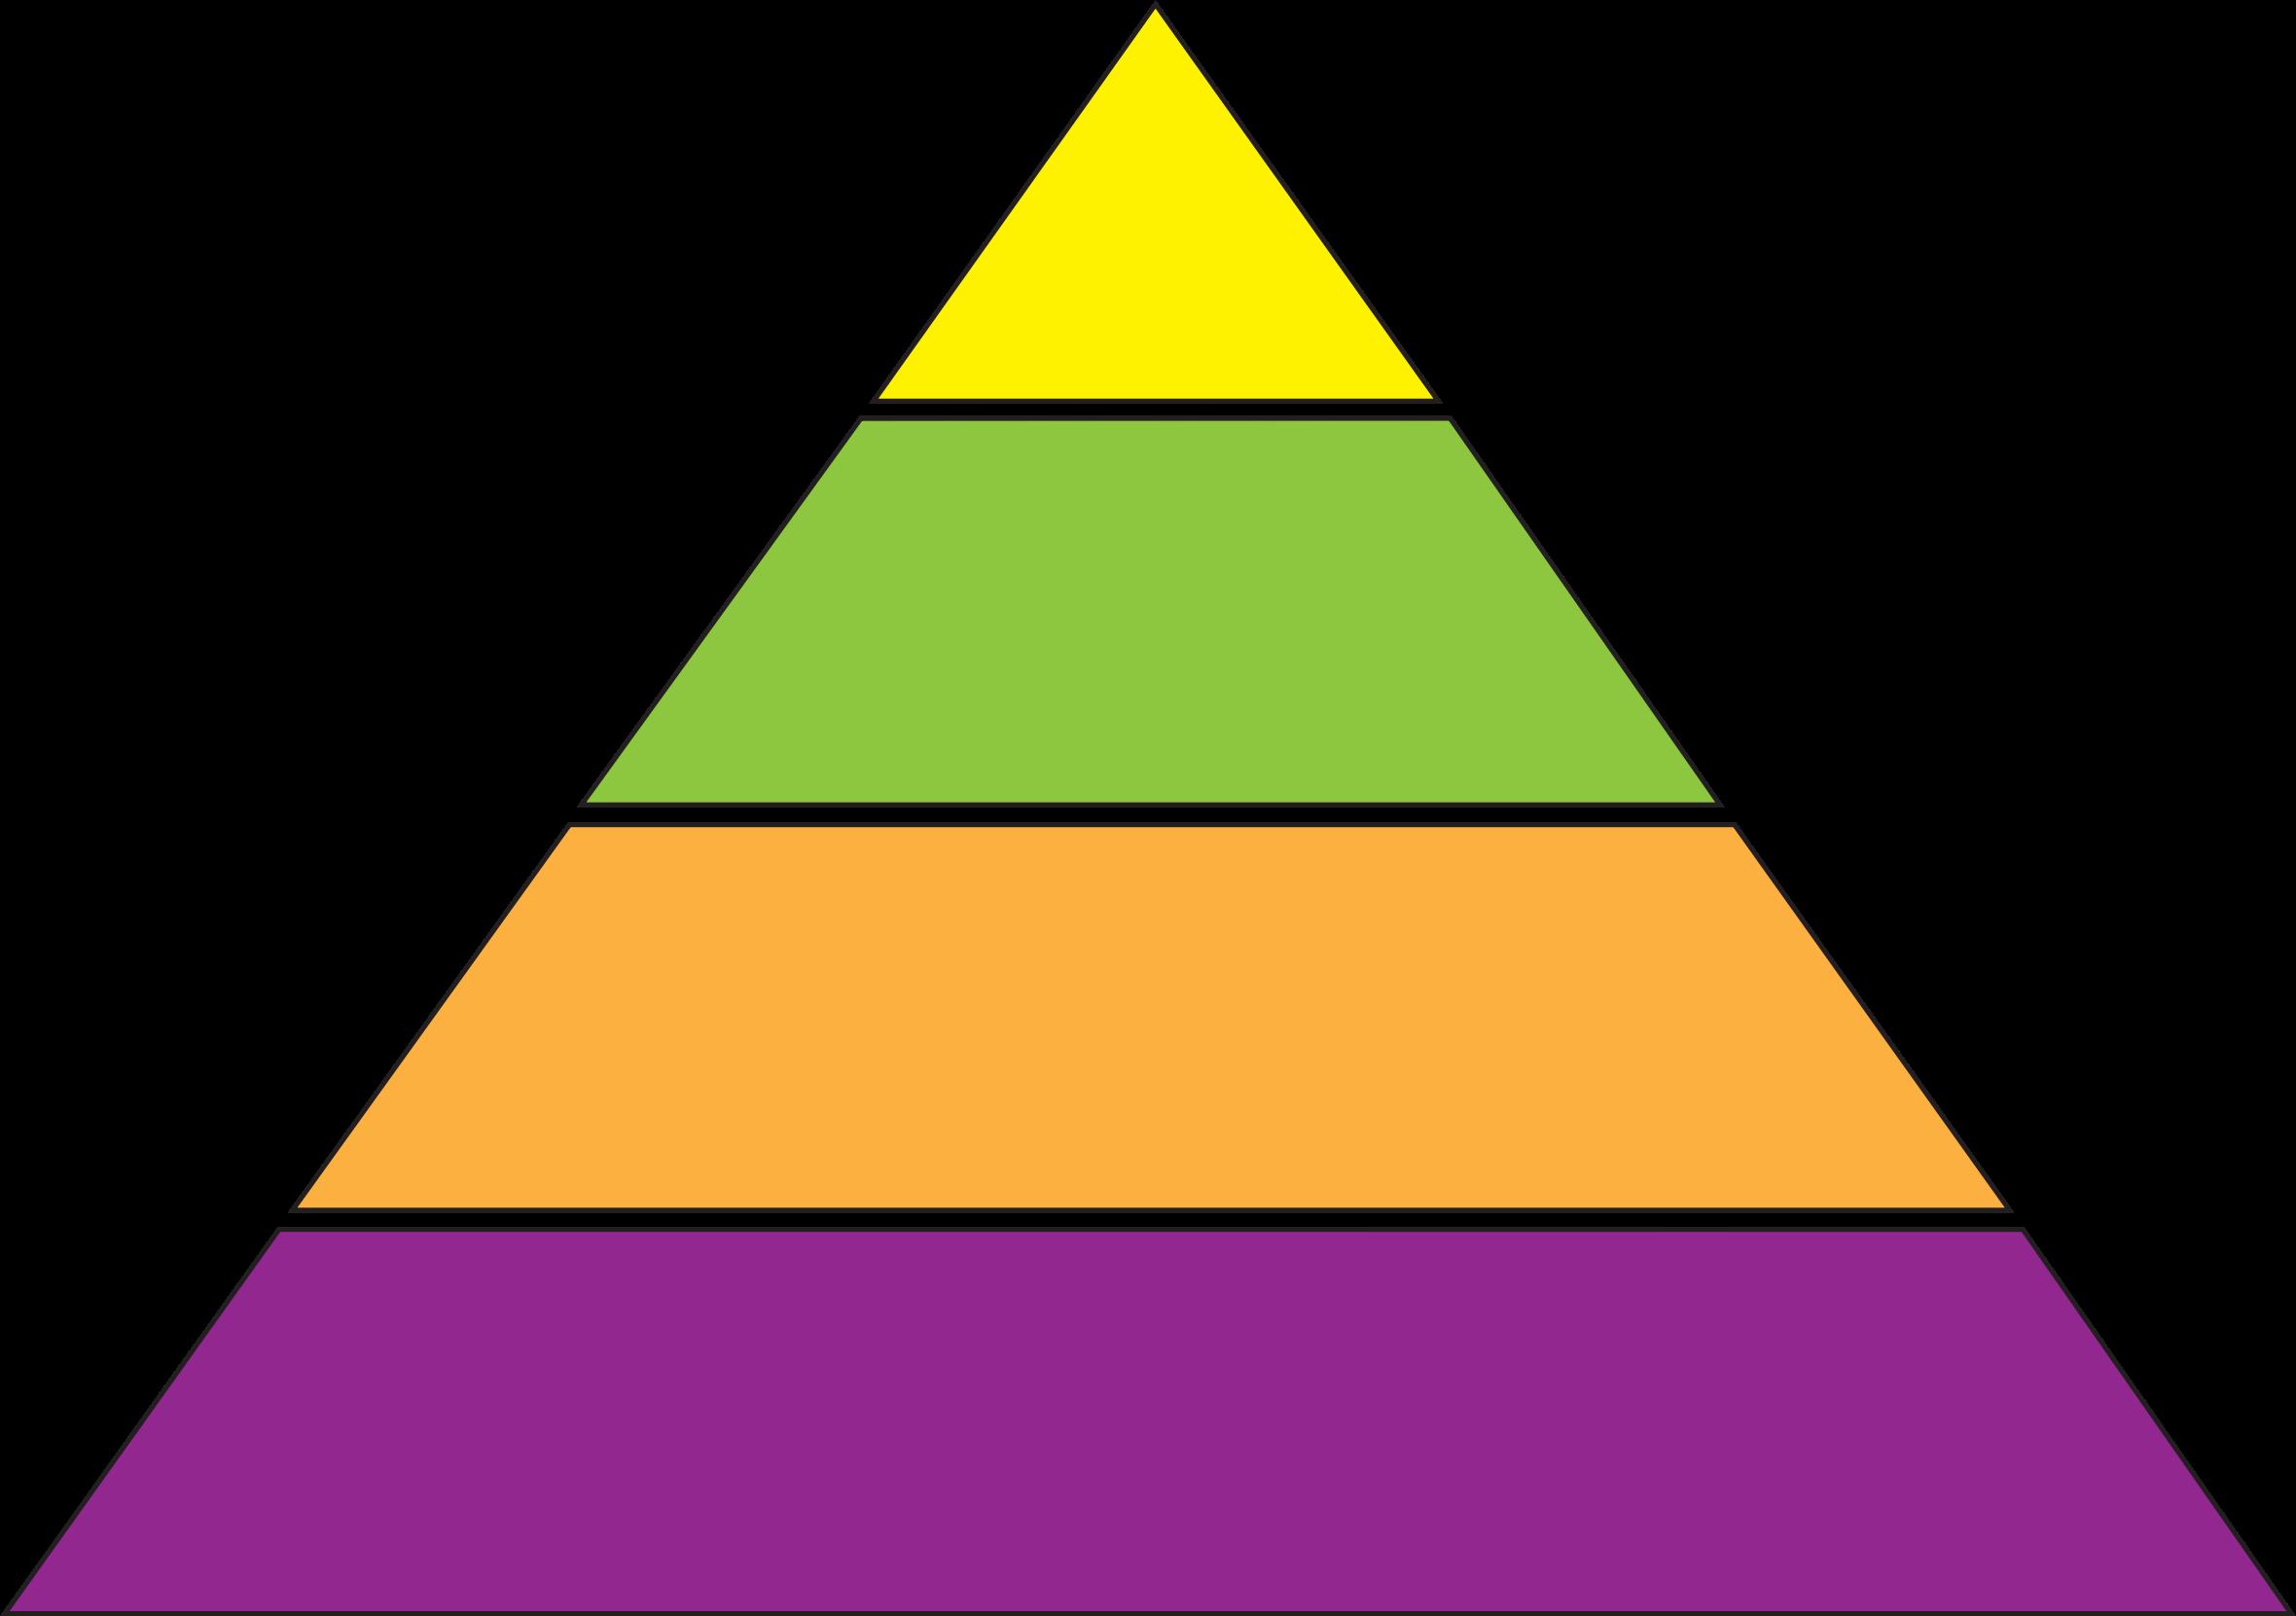 Pyramid Clipart #1